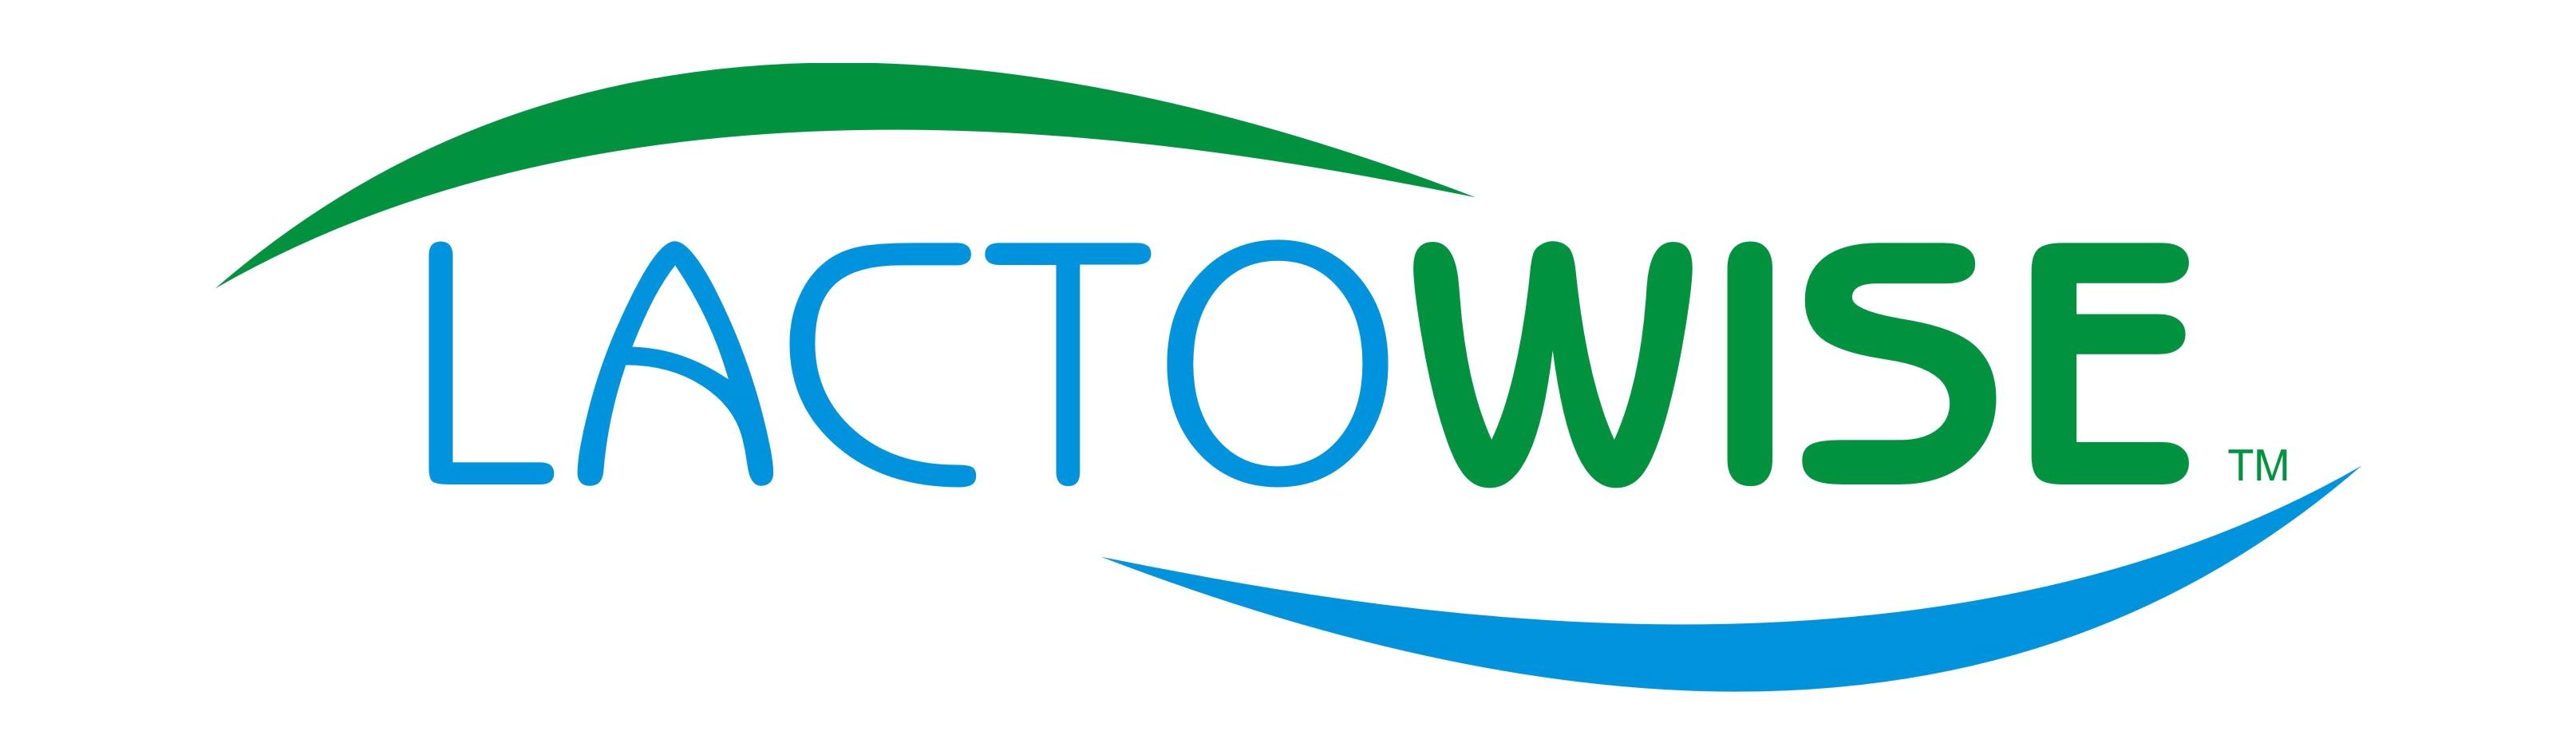 LactoWise®